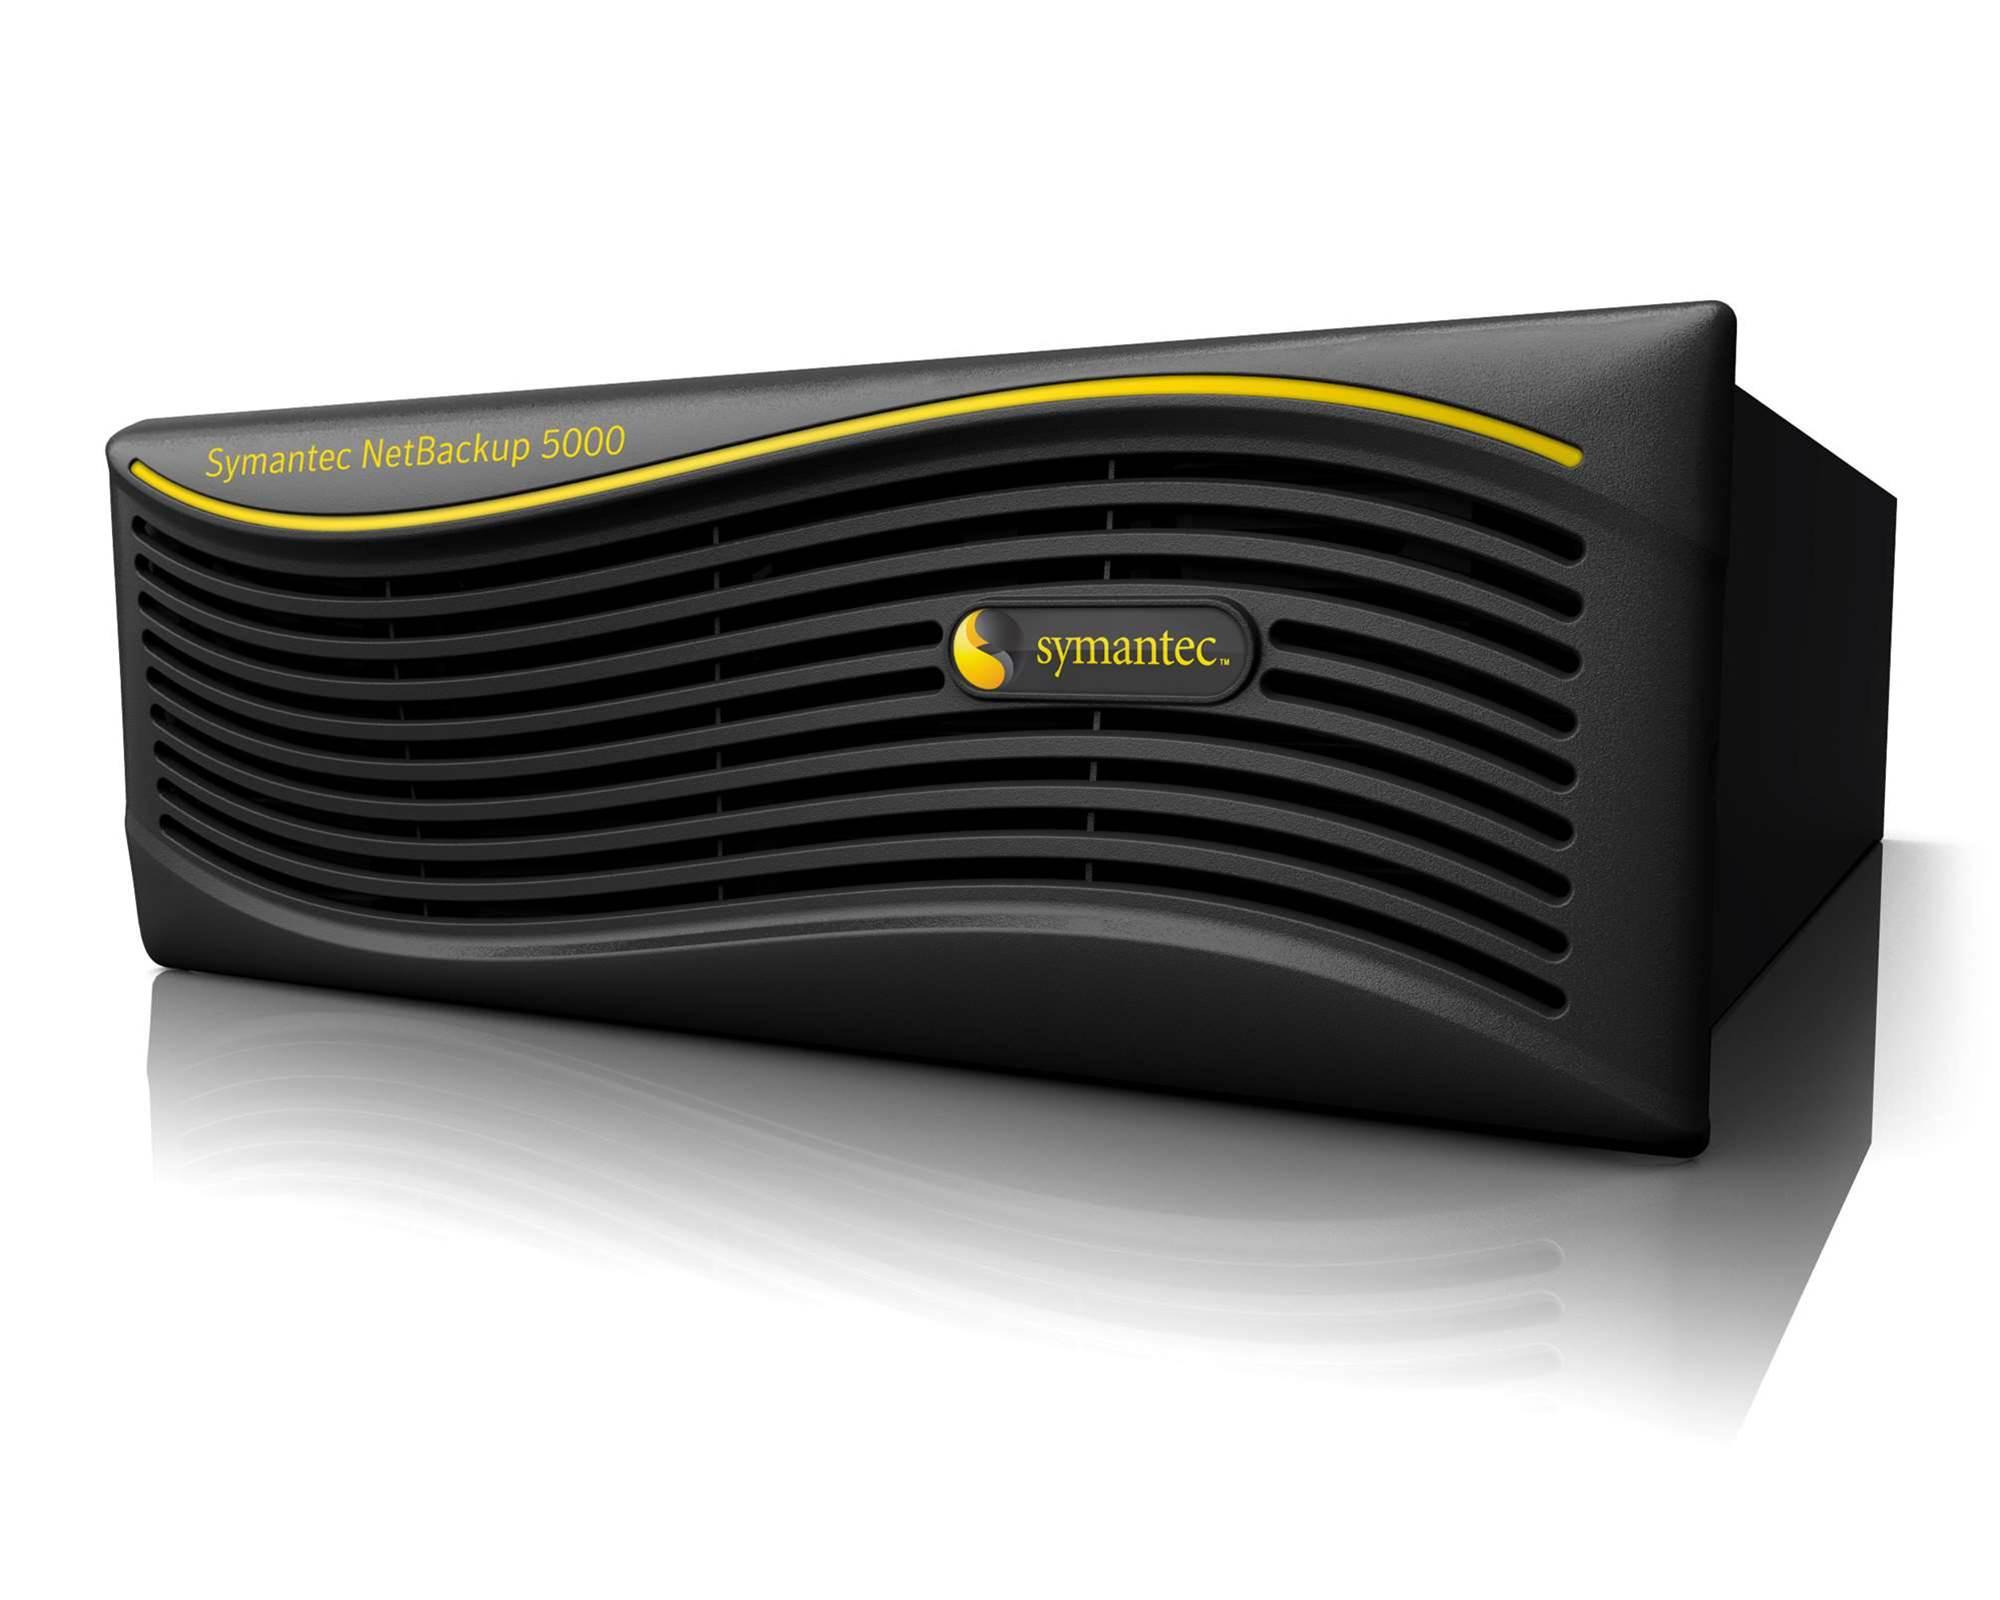 Symantec guns for storage appliance market